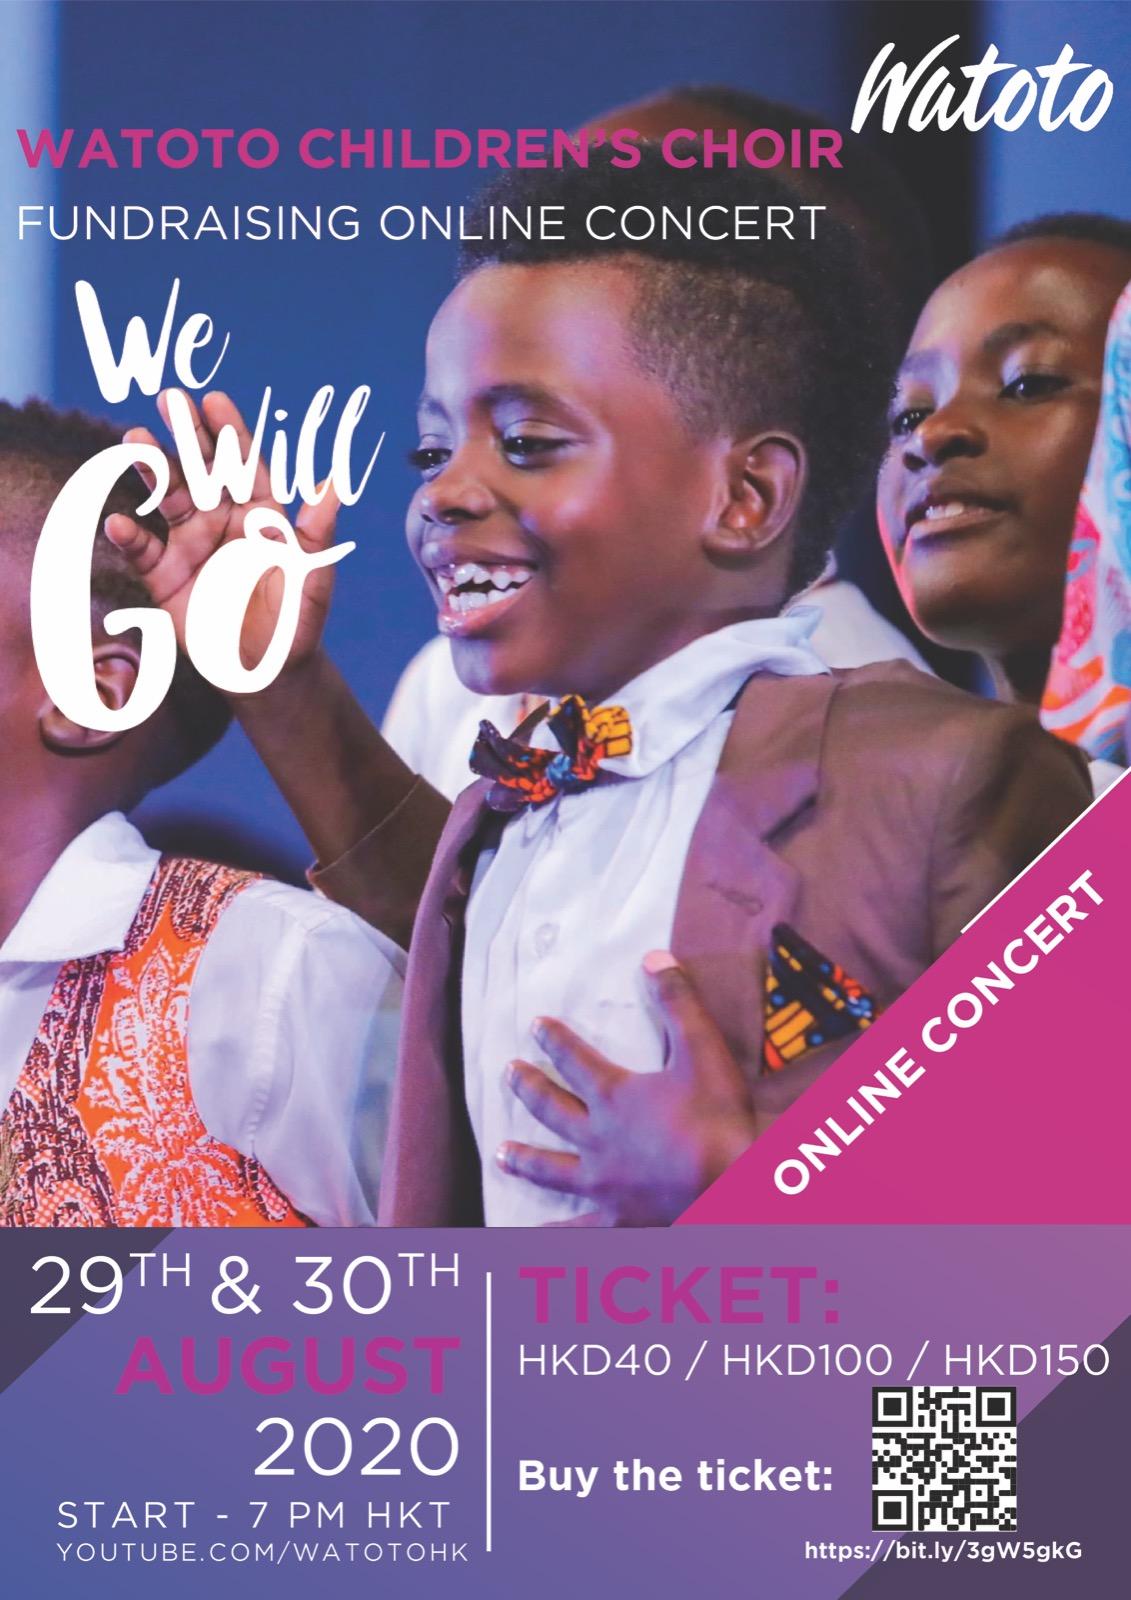 Watoto Children's Choir Fundraising Online Concert 29 & 30 August 2020